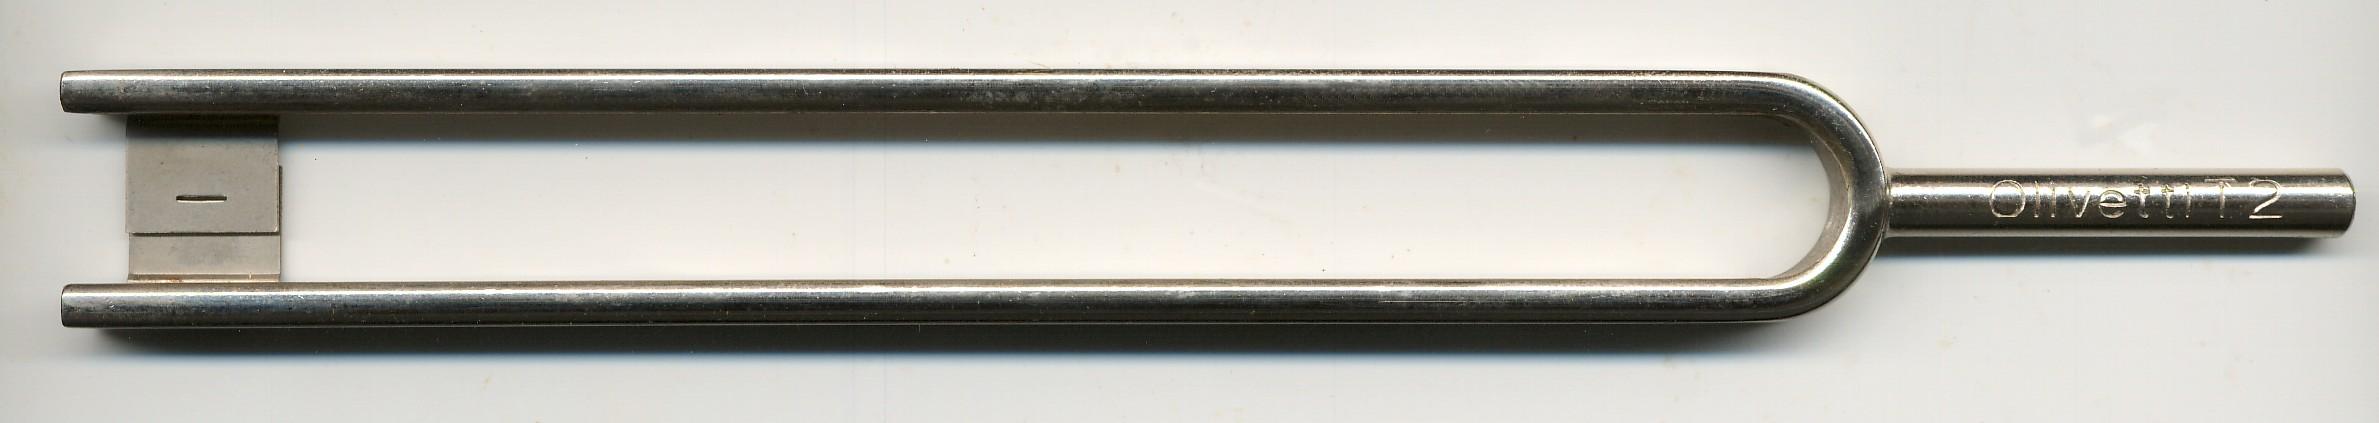 Tuning fork 125 Hz - Olivetti teletype